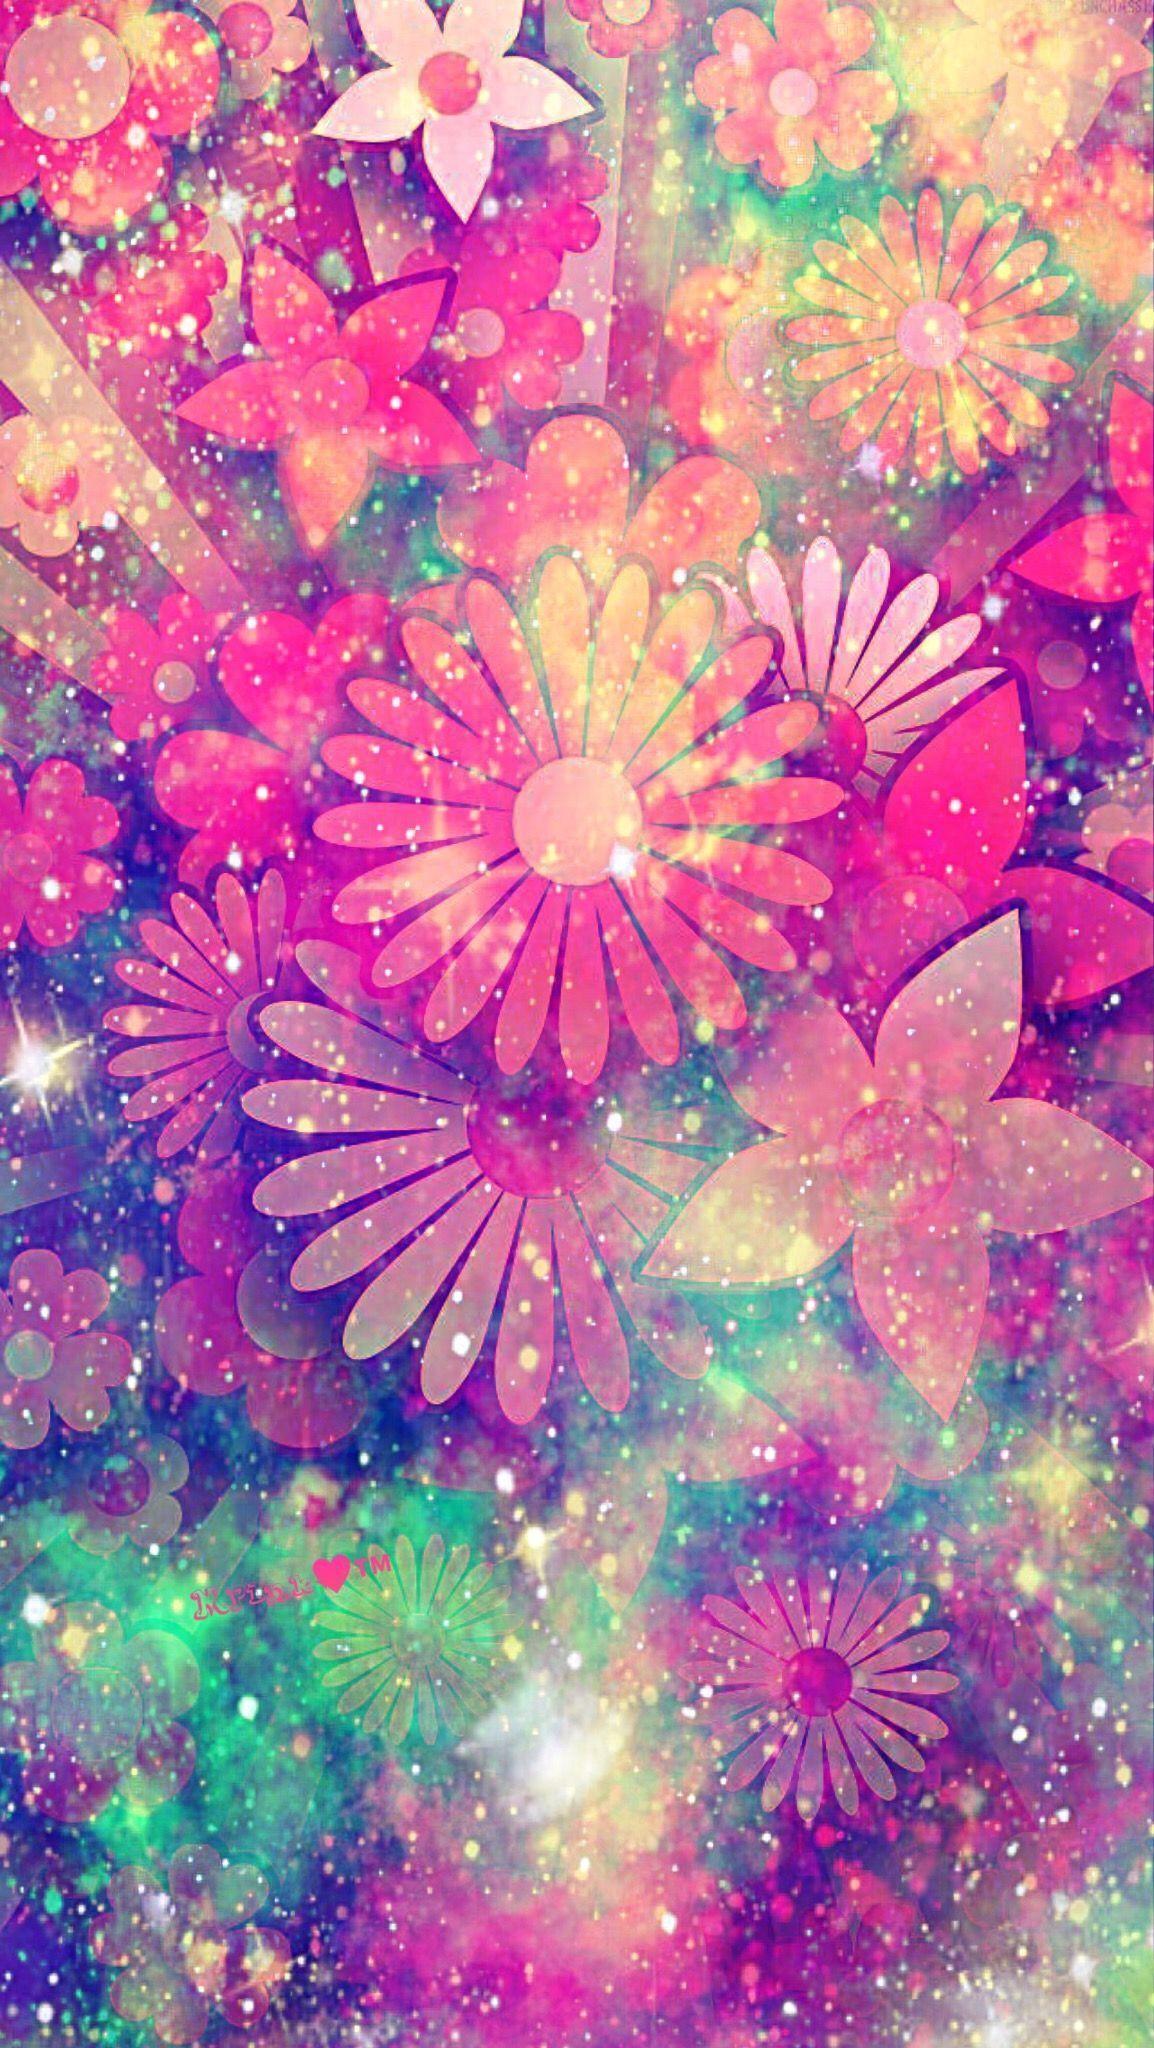 Rose Gold Pink Galaxy 736x1306 Download Hd Wallpaper Wallpapertip